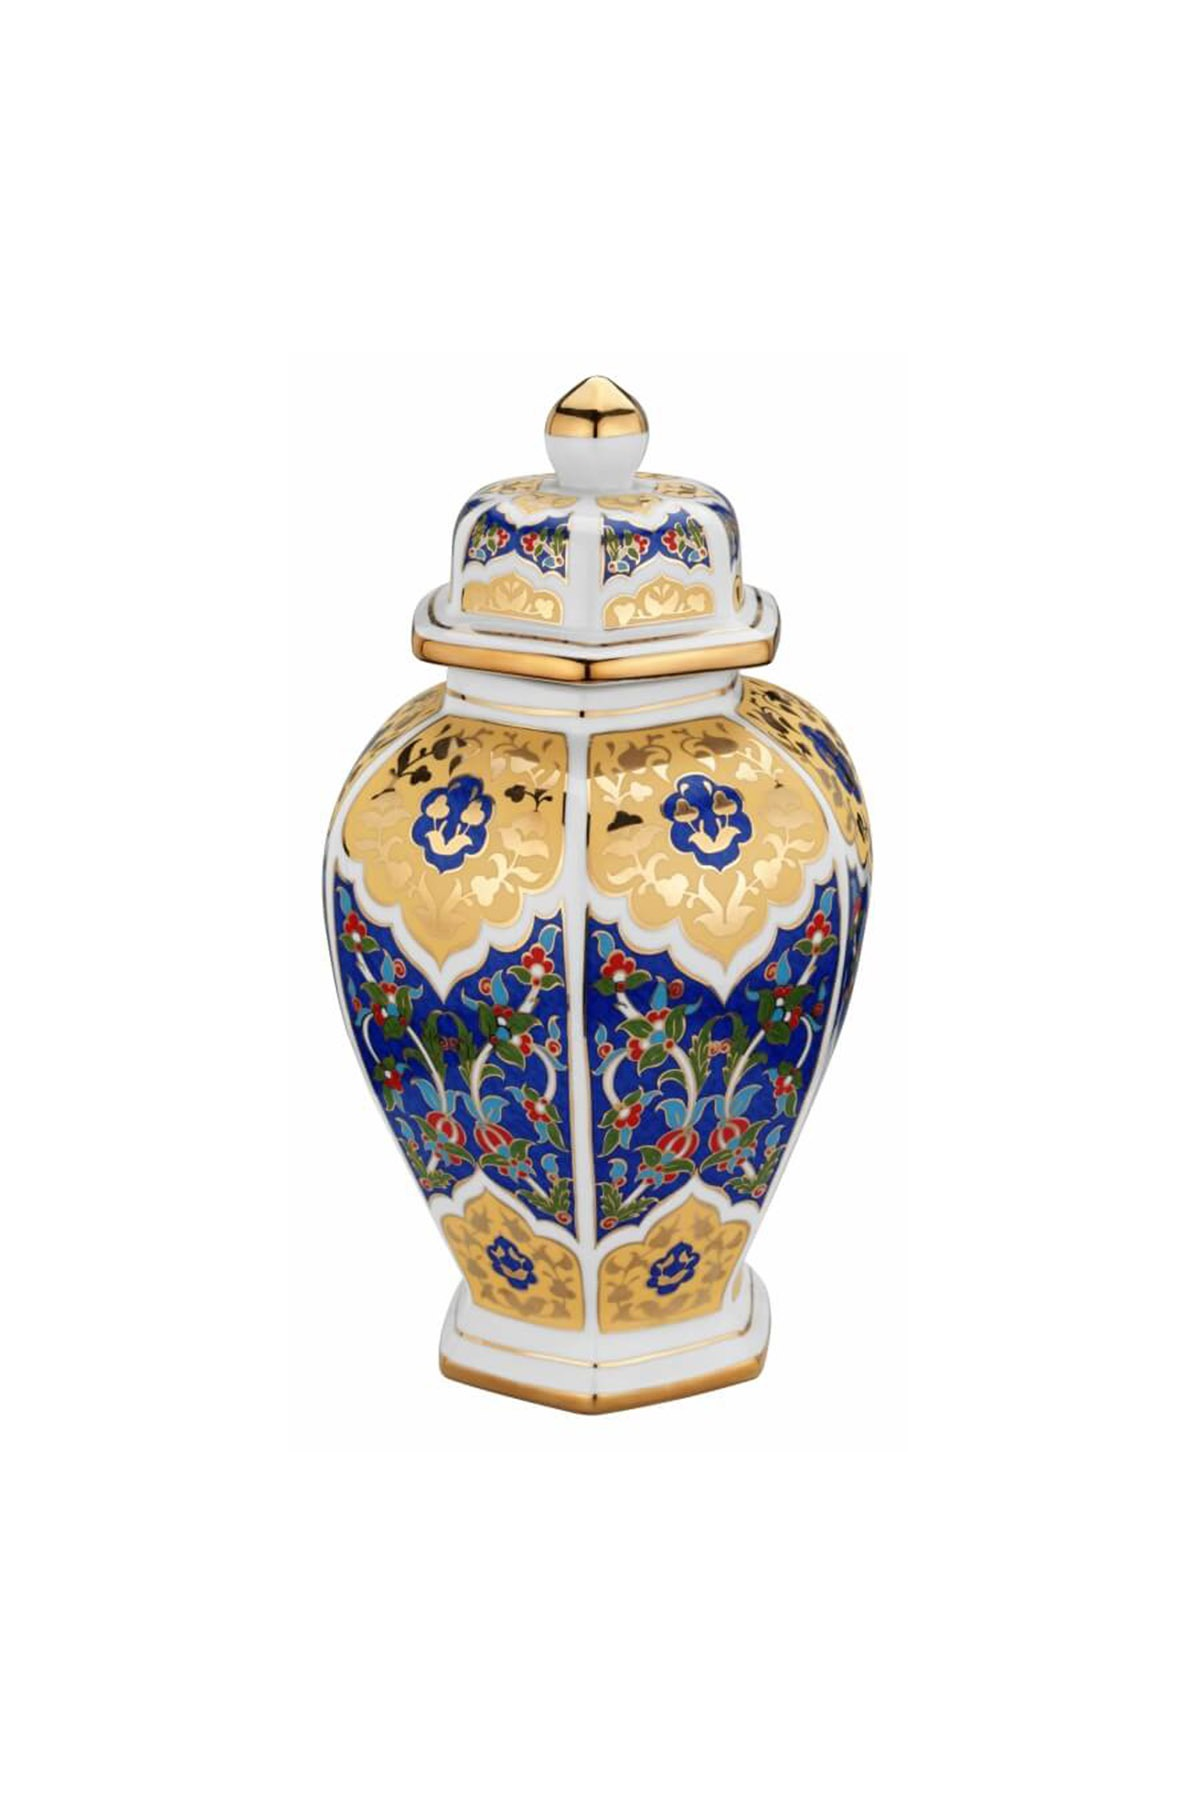 Kütahya Porselen - Kütahya Porselen Sırküpü Kavanoz 30 Cm Dekor No:3880